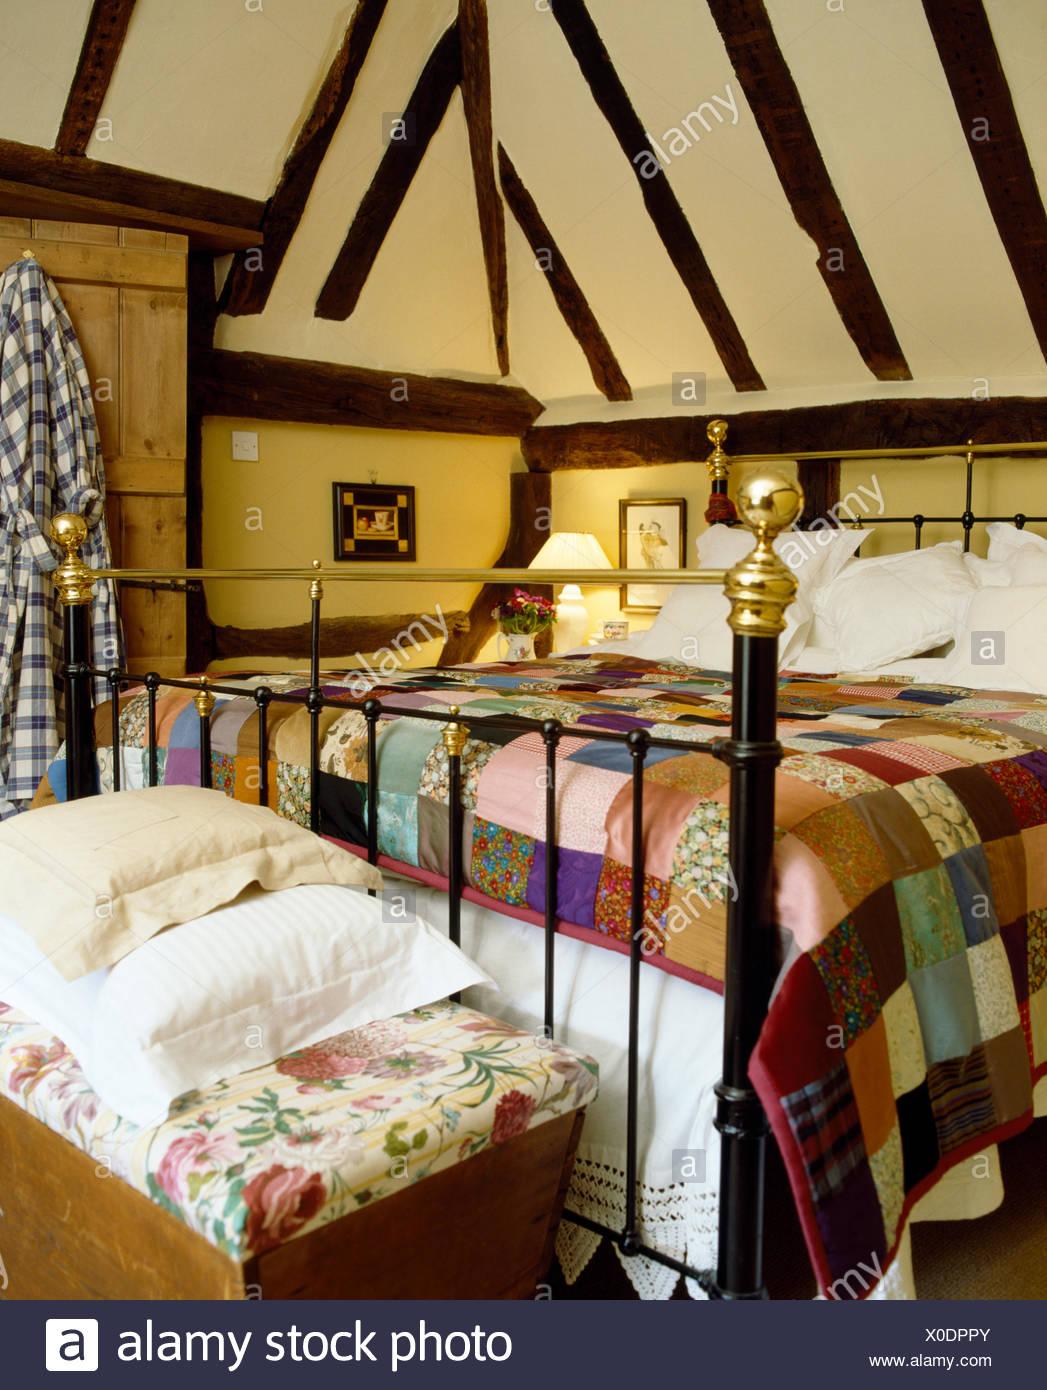 Bunte Patchwork quilt auf antikem Messingbett im Ferienhaus ...